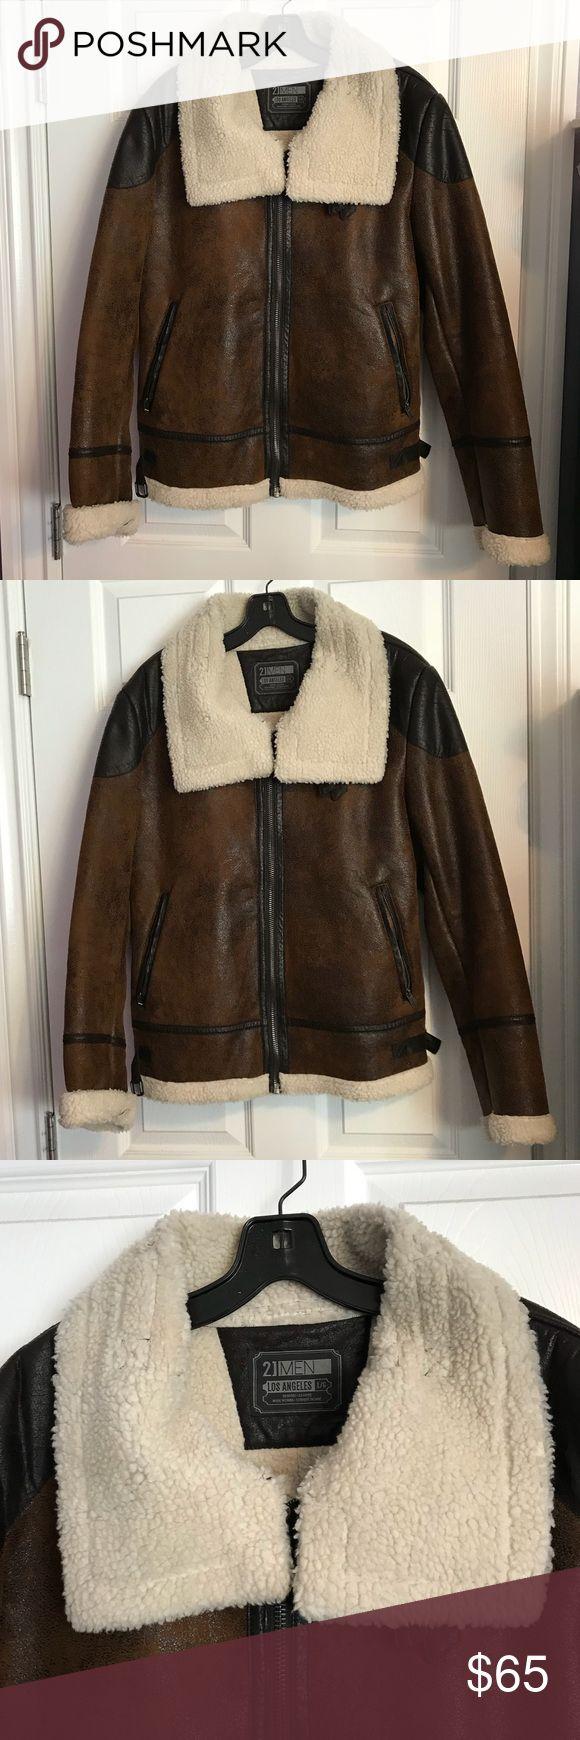 "Brown Bomber Jacket Fleece Collar Forever 21 Large Brown bomber jacket. Faux leather, faux fleece. 21.5"" armpit to armpit, 26.5"" sleeve length, 26"" shoulder to hem. 21MEN Jackets & Coats Bomber & Varsity"